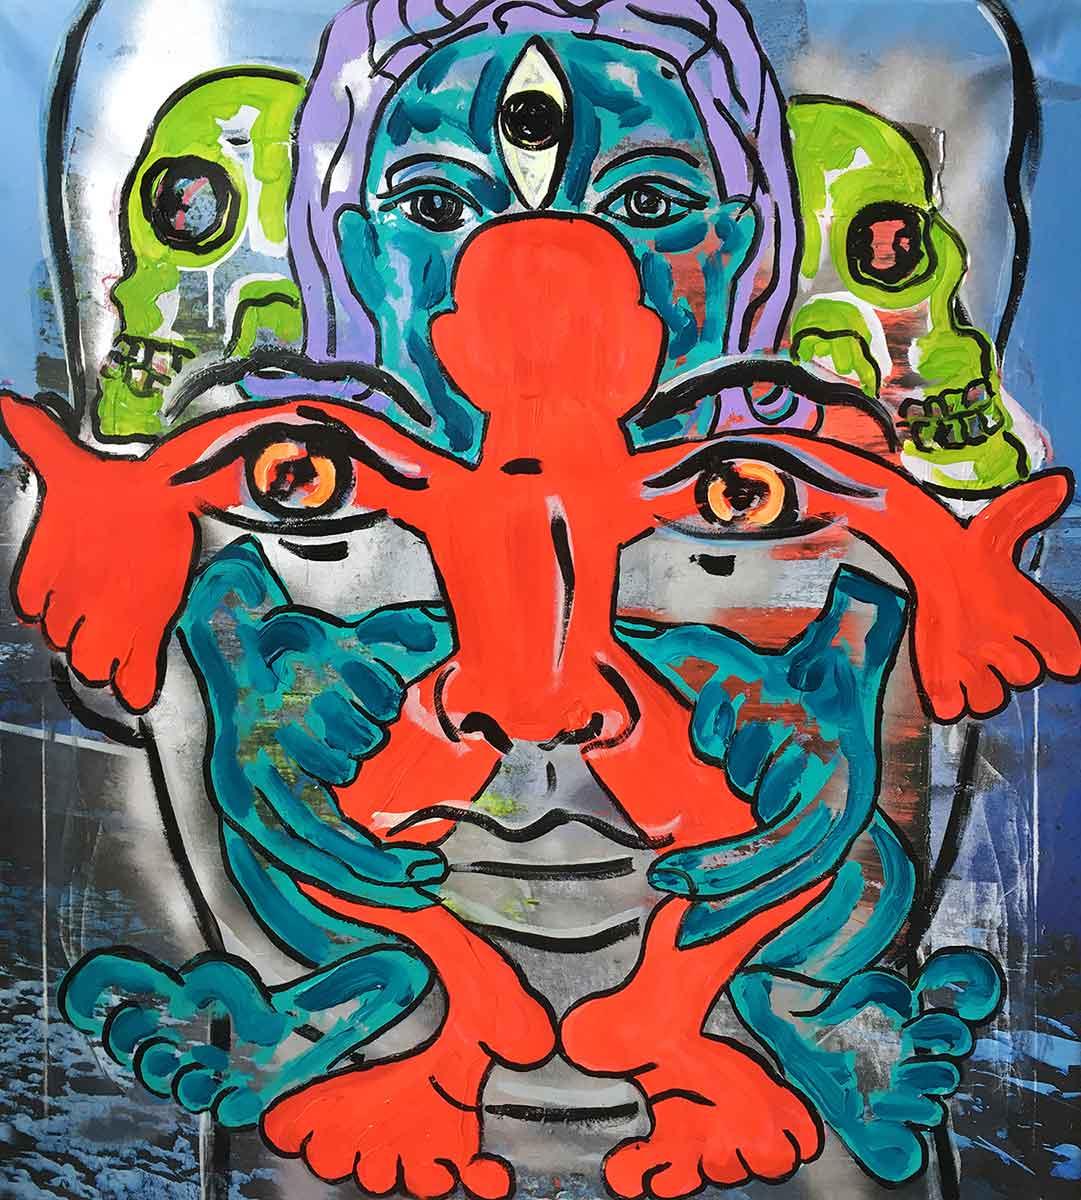 Matej Fabian – Dystopian Prophecy